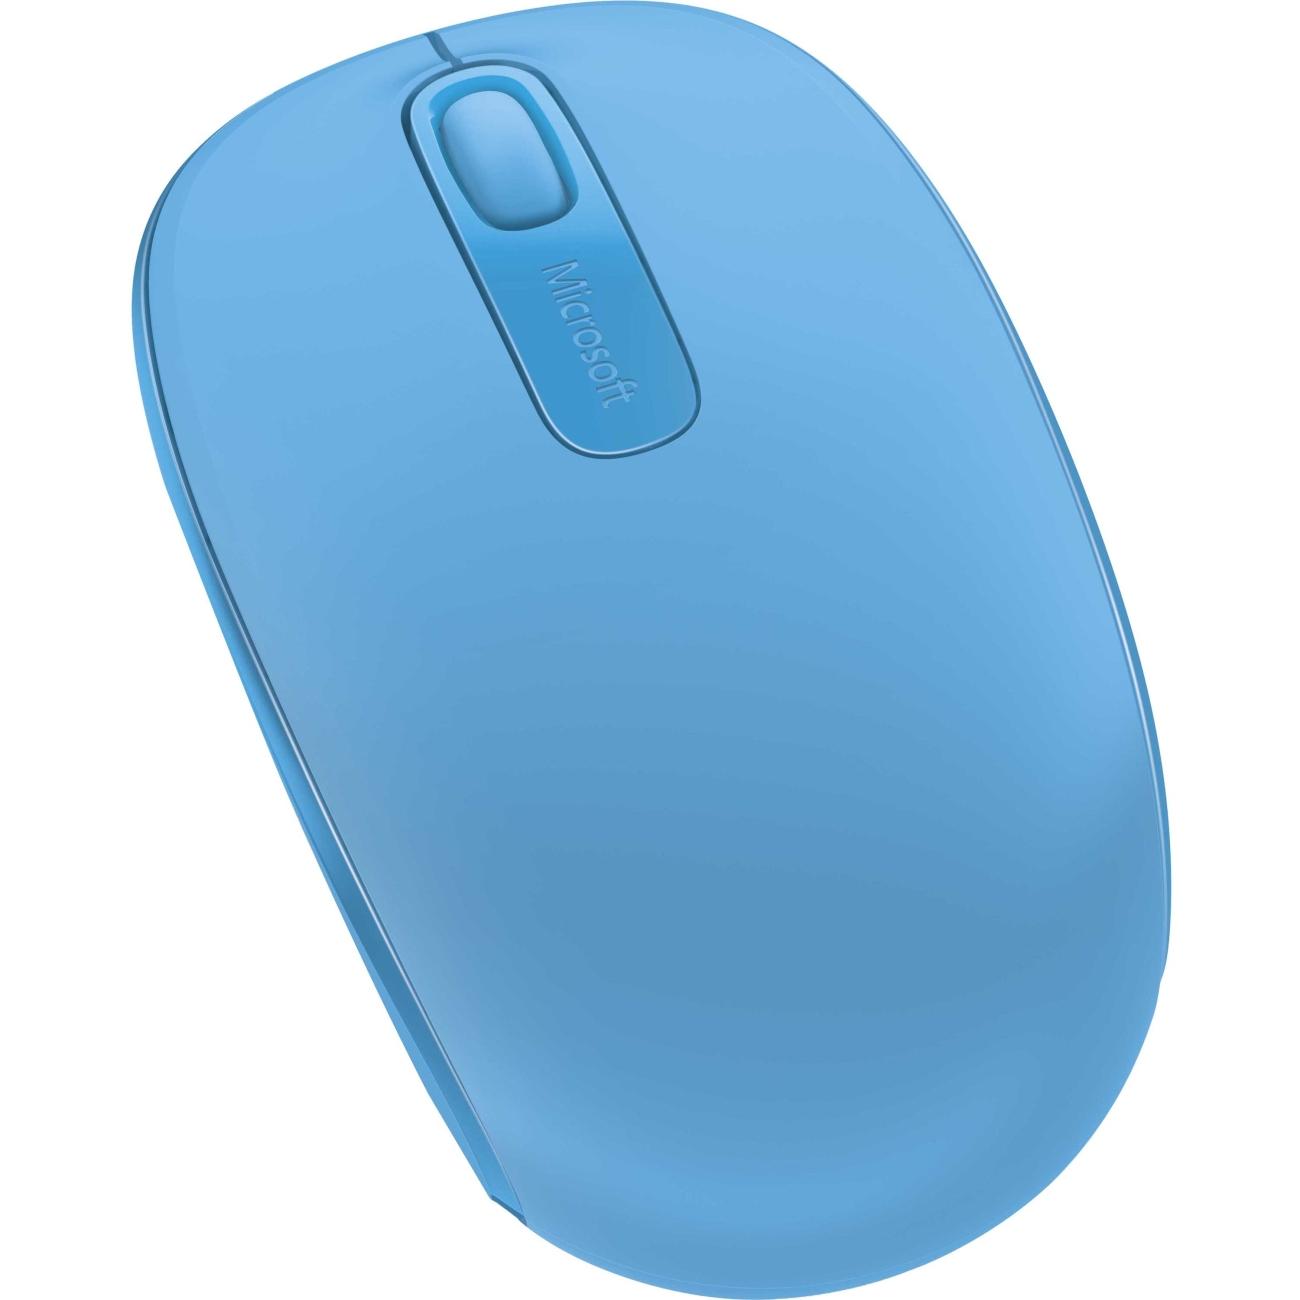 Mouse Microsoft Wireless Mobile 1850 Cyan